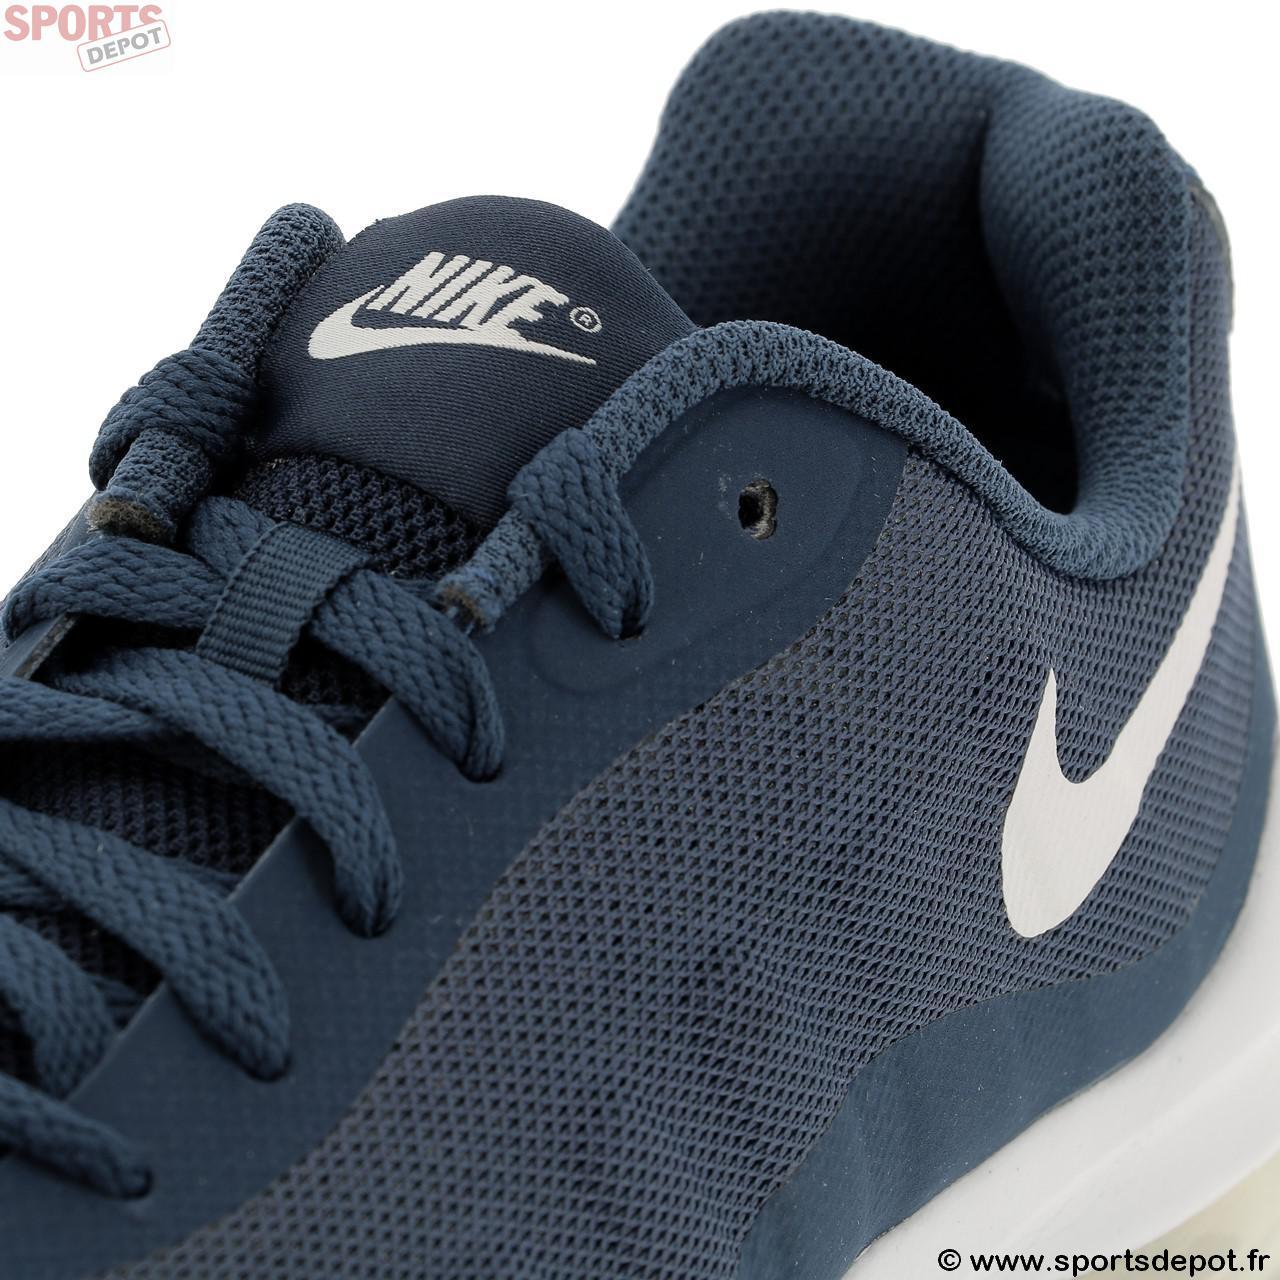 Acheter Chaussures multisport NIKE Air max invigor bleu jr